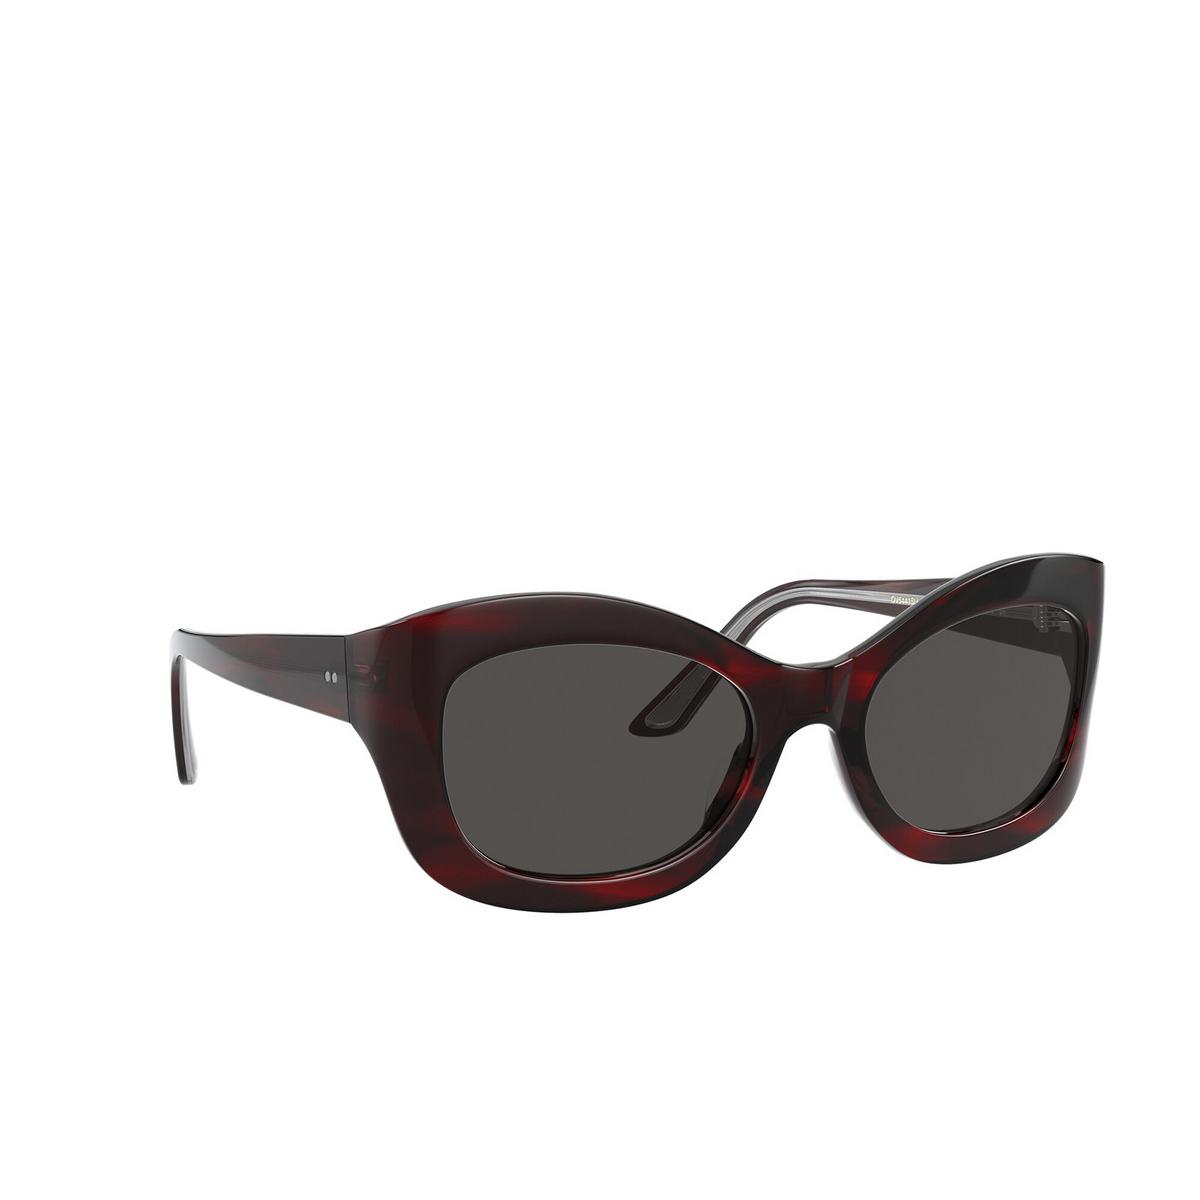 Oliver Peoples® Butterfly Sunglasses: Edina OV5441SU color Bordeaux Bark 167587 - three-quarters view.